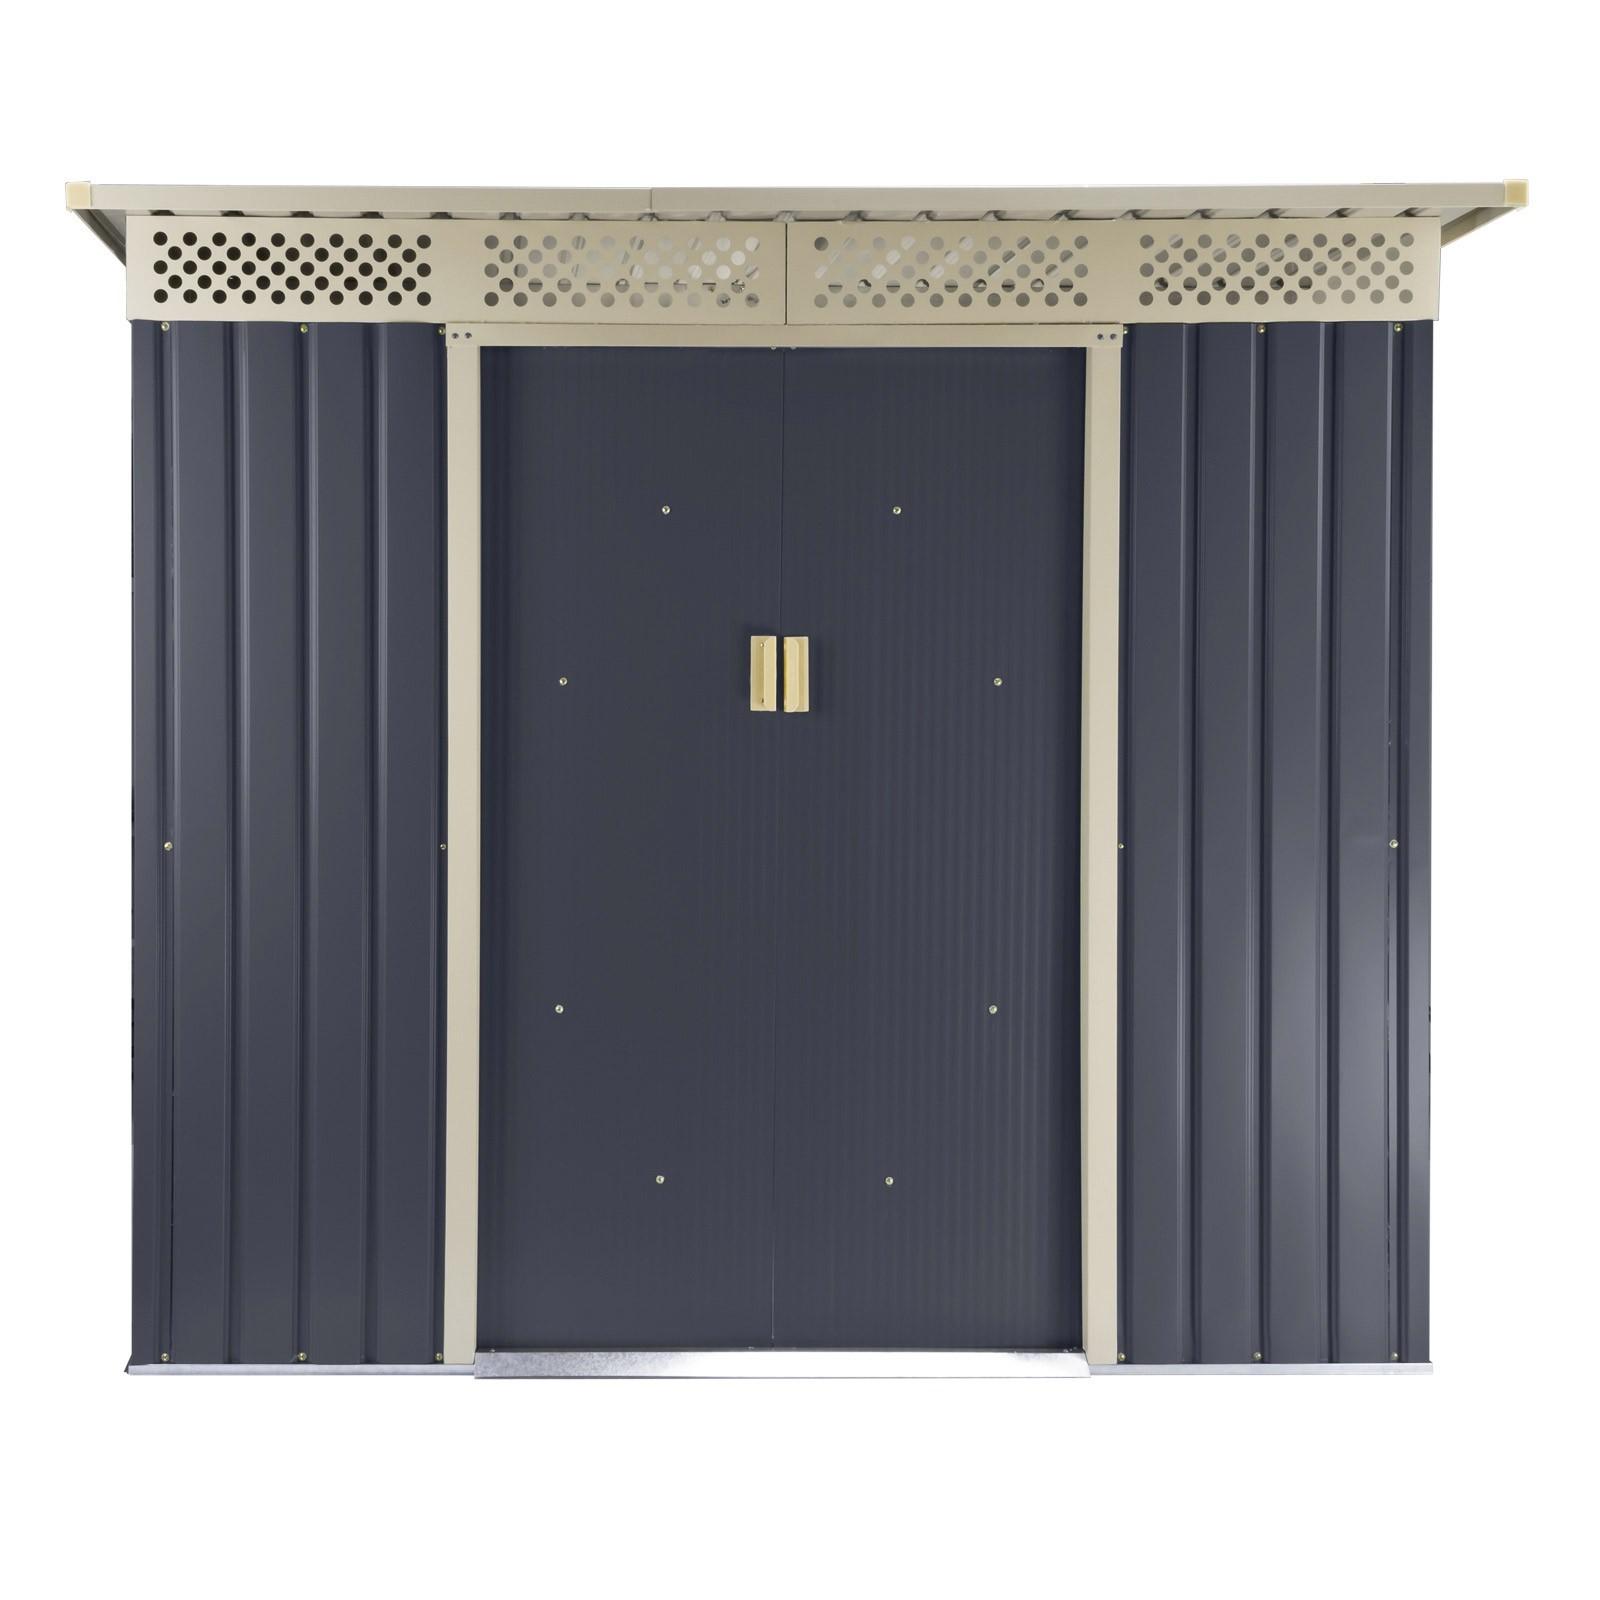 ger tehaus gartenhaus bristol metall 2 4 qm anthrazit. Black Bedroom Furniture Sets. Home Design Ideas